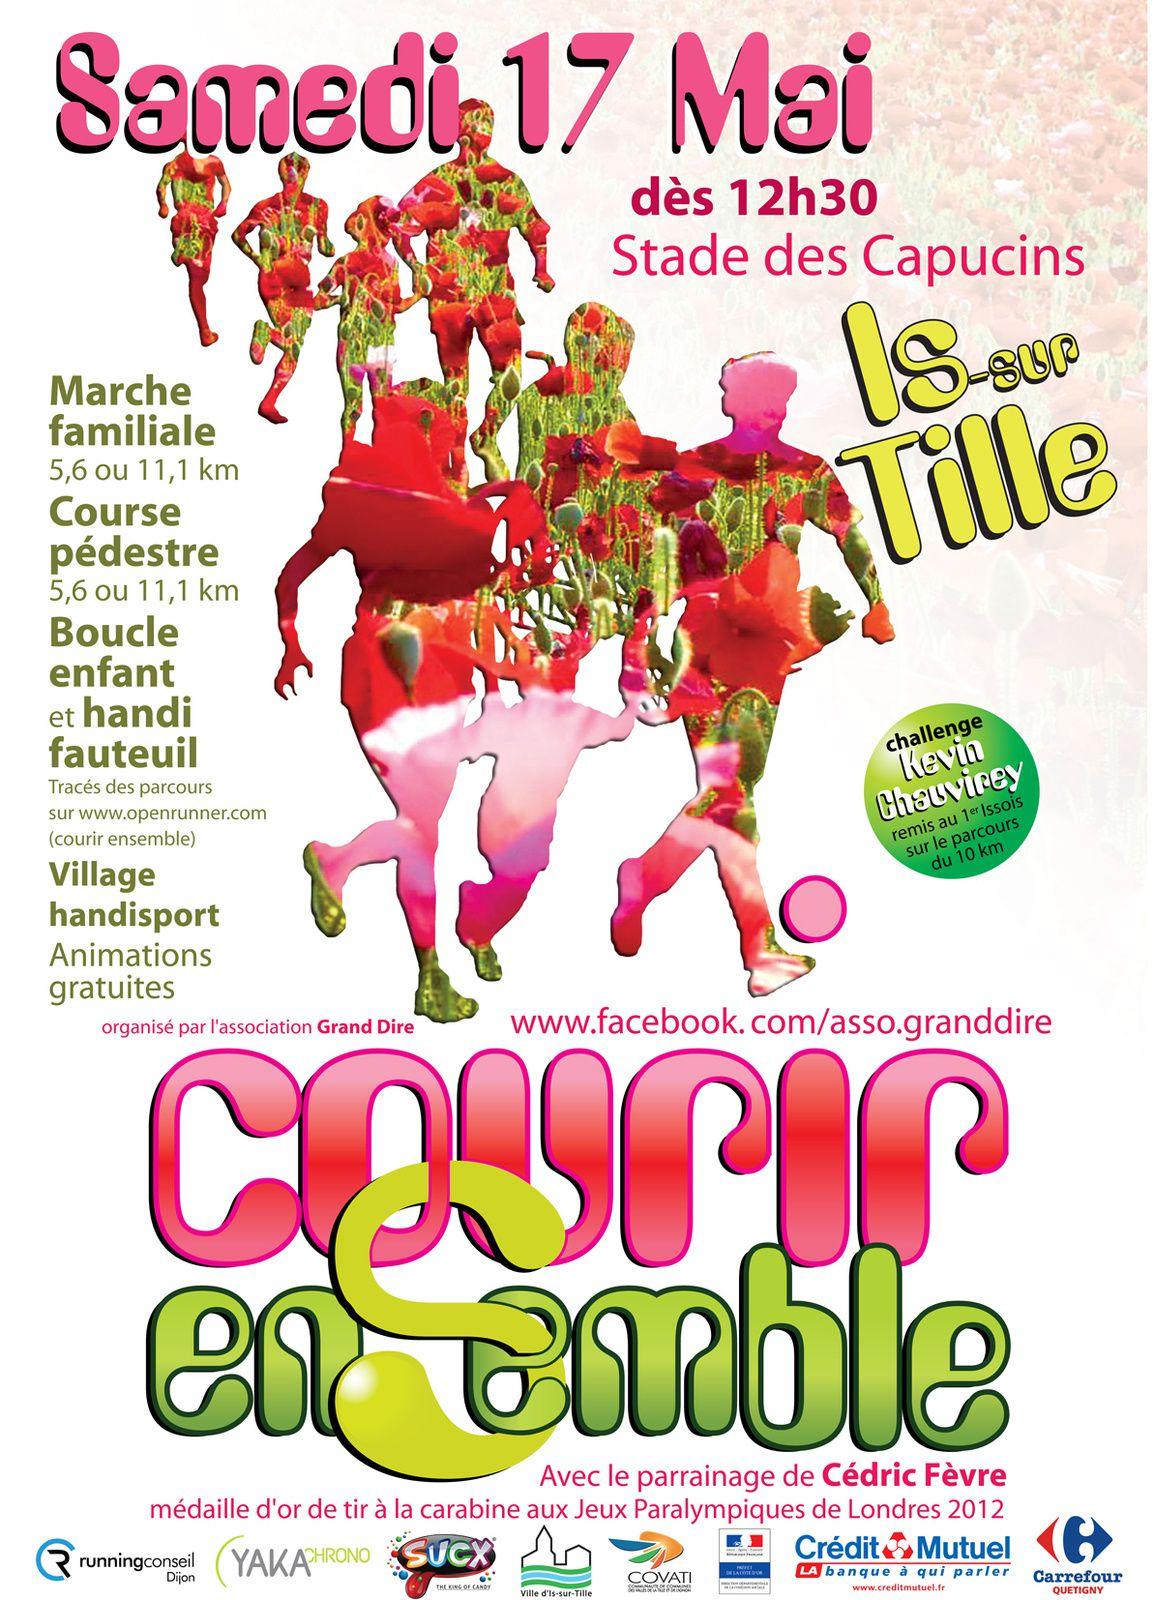 Samedi 17 mai - Courir Ensemble - Is sur Tille